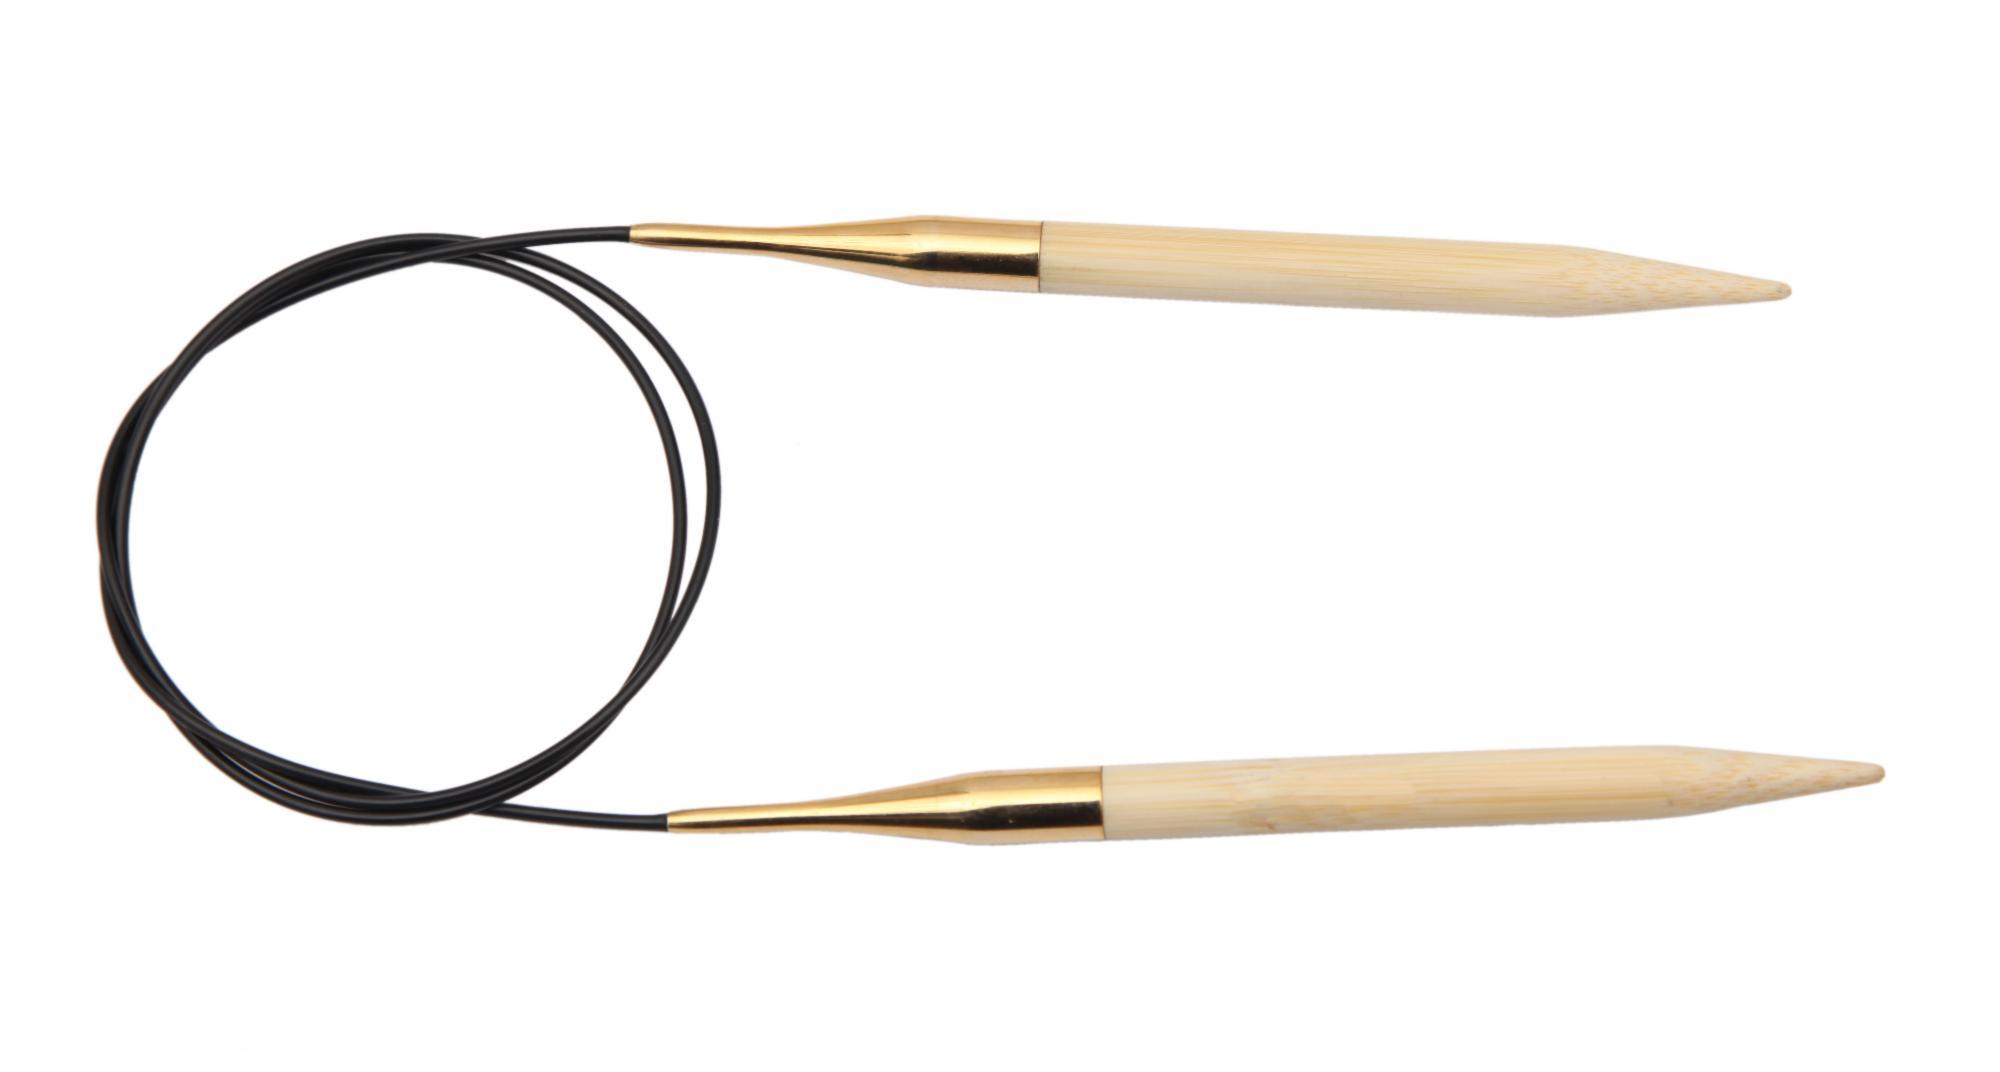 Спицы круговые 100 см Bamboo KnitPro, 22277, 3.25 мм